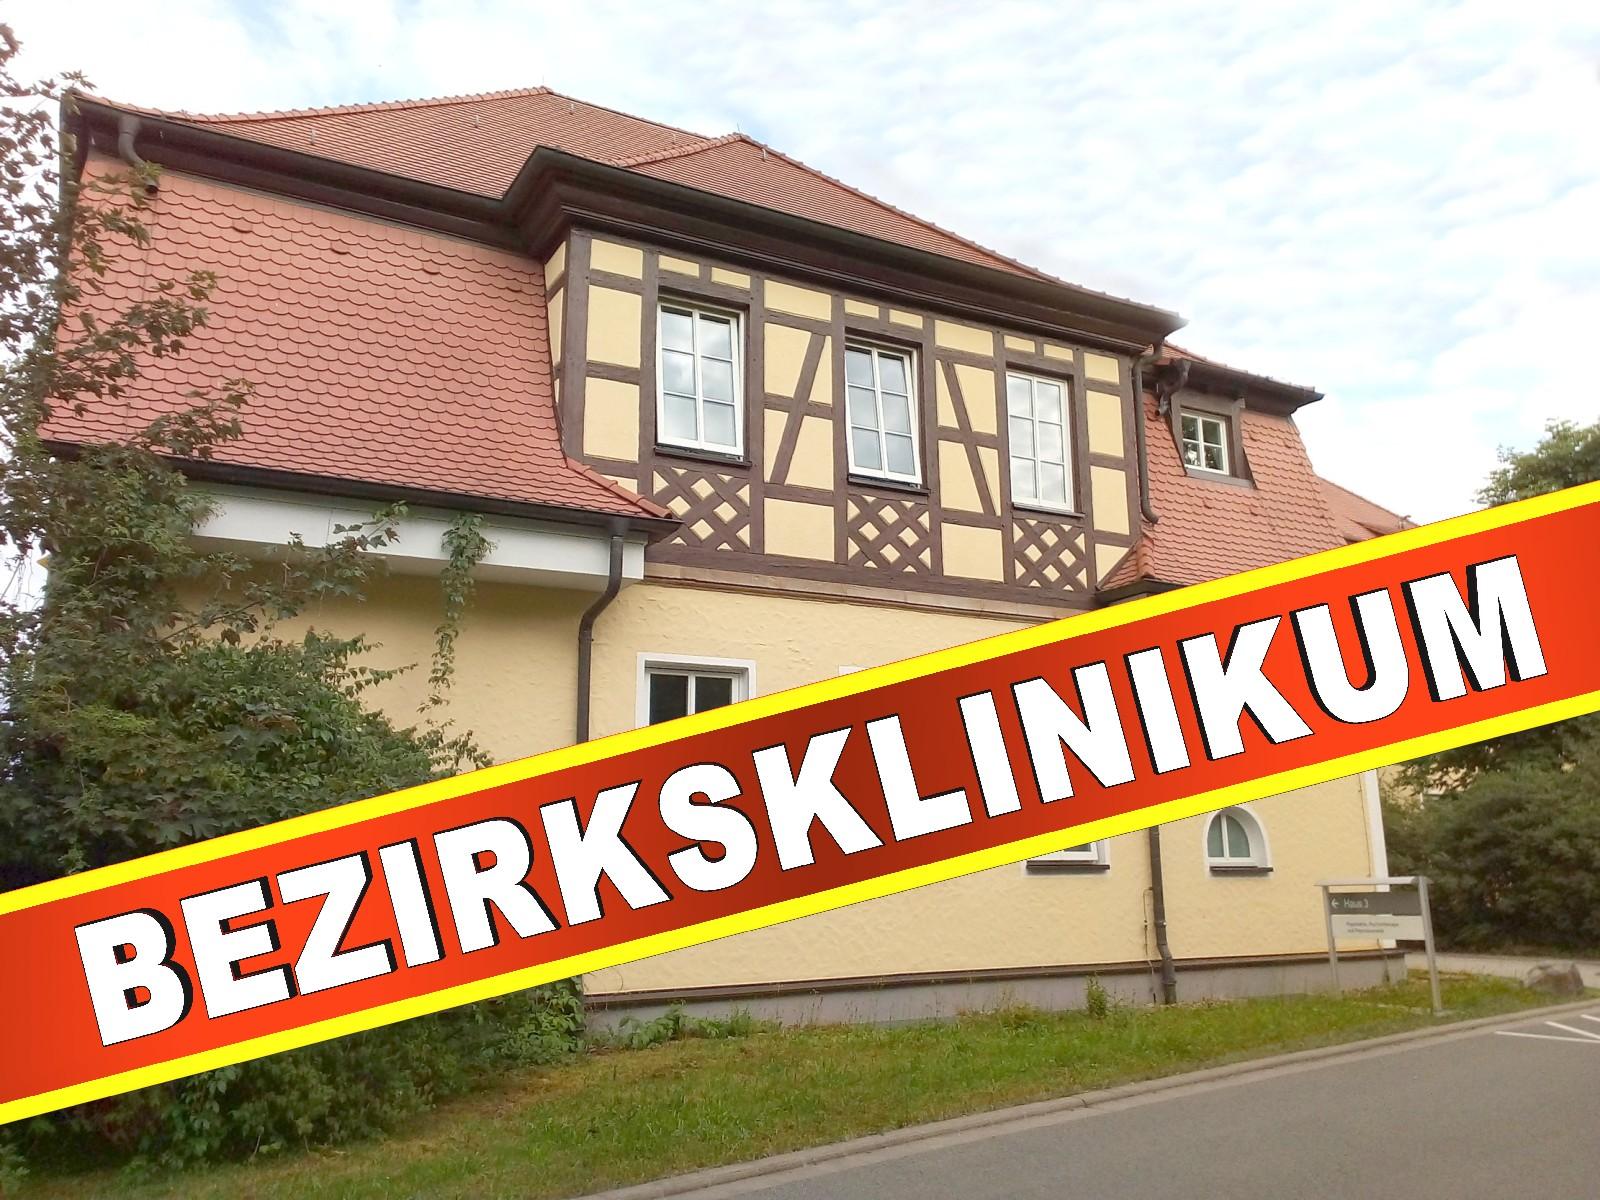 Bezirksklinikum Obermain Kutzenberg, 96250 Ebensfeld Psychiatrie Polizei Krankenhaus (44)